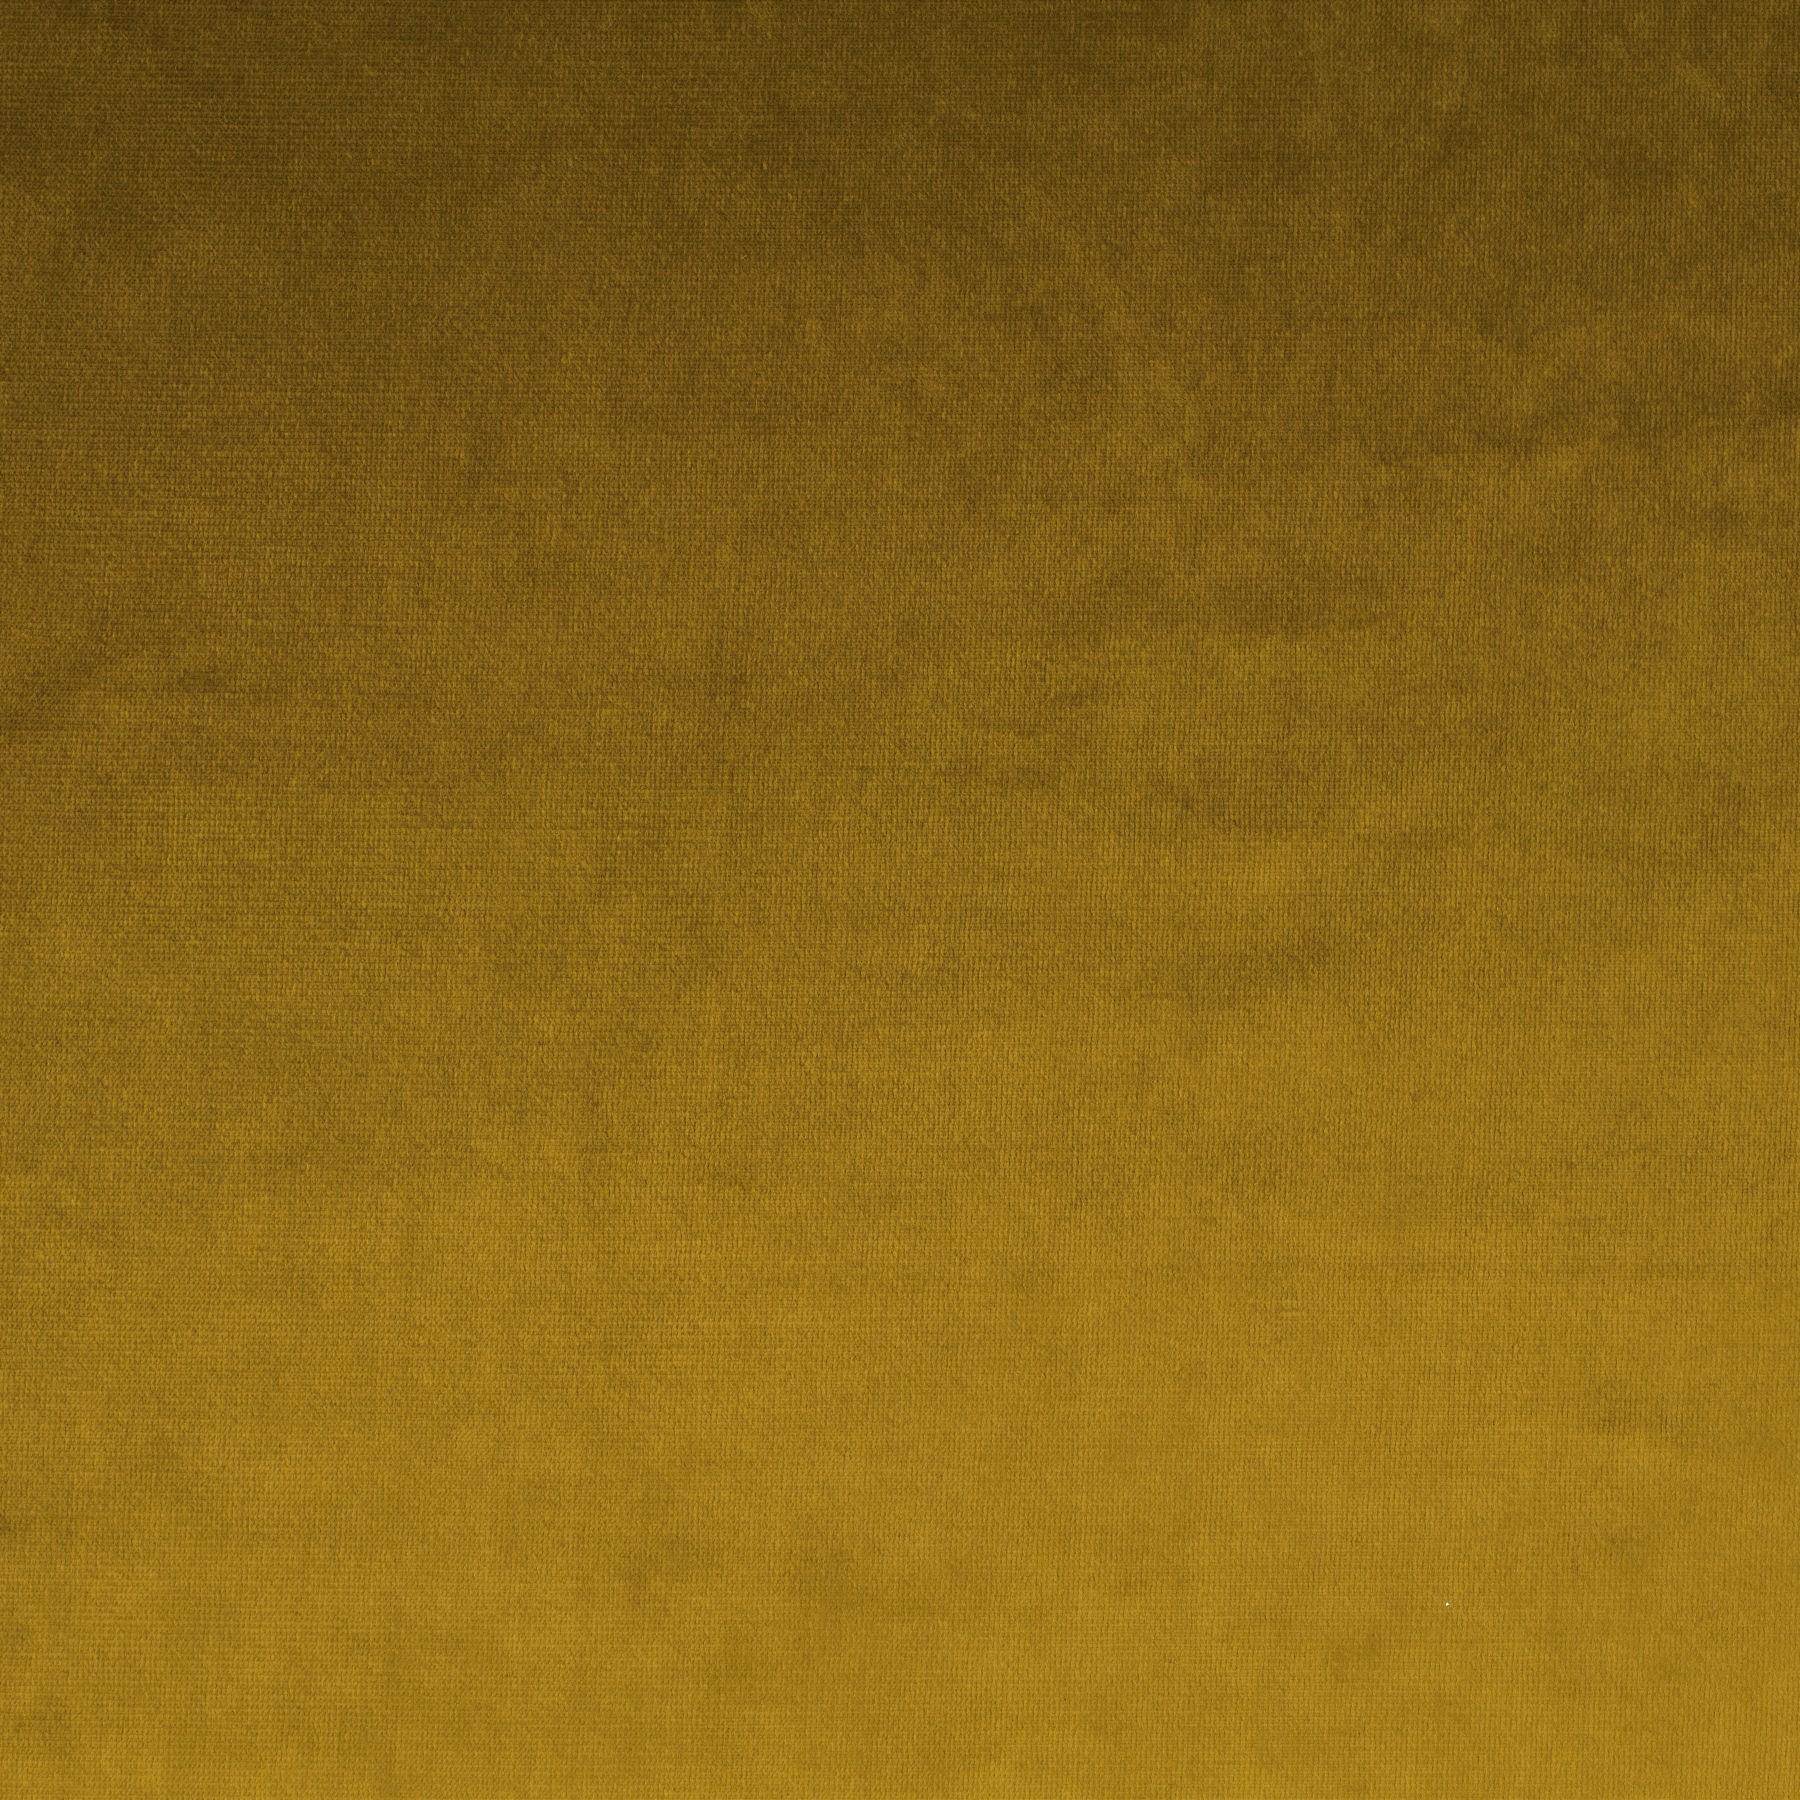 upholstery fabric la belle vol 2 1 3119 046 jab anstoetz. Black Bedroom Furniture Sets. Home Design Ideas